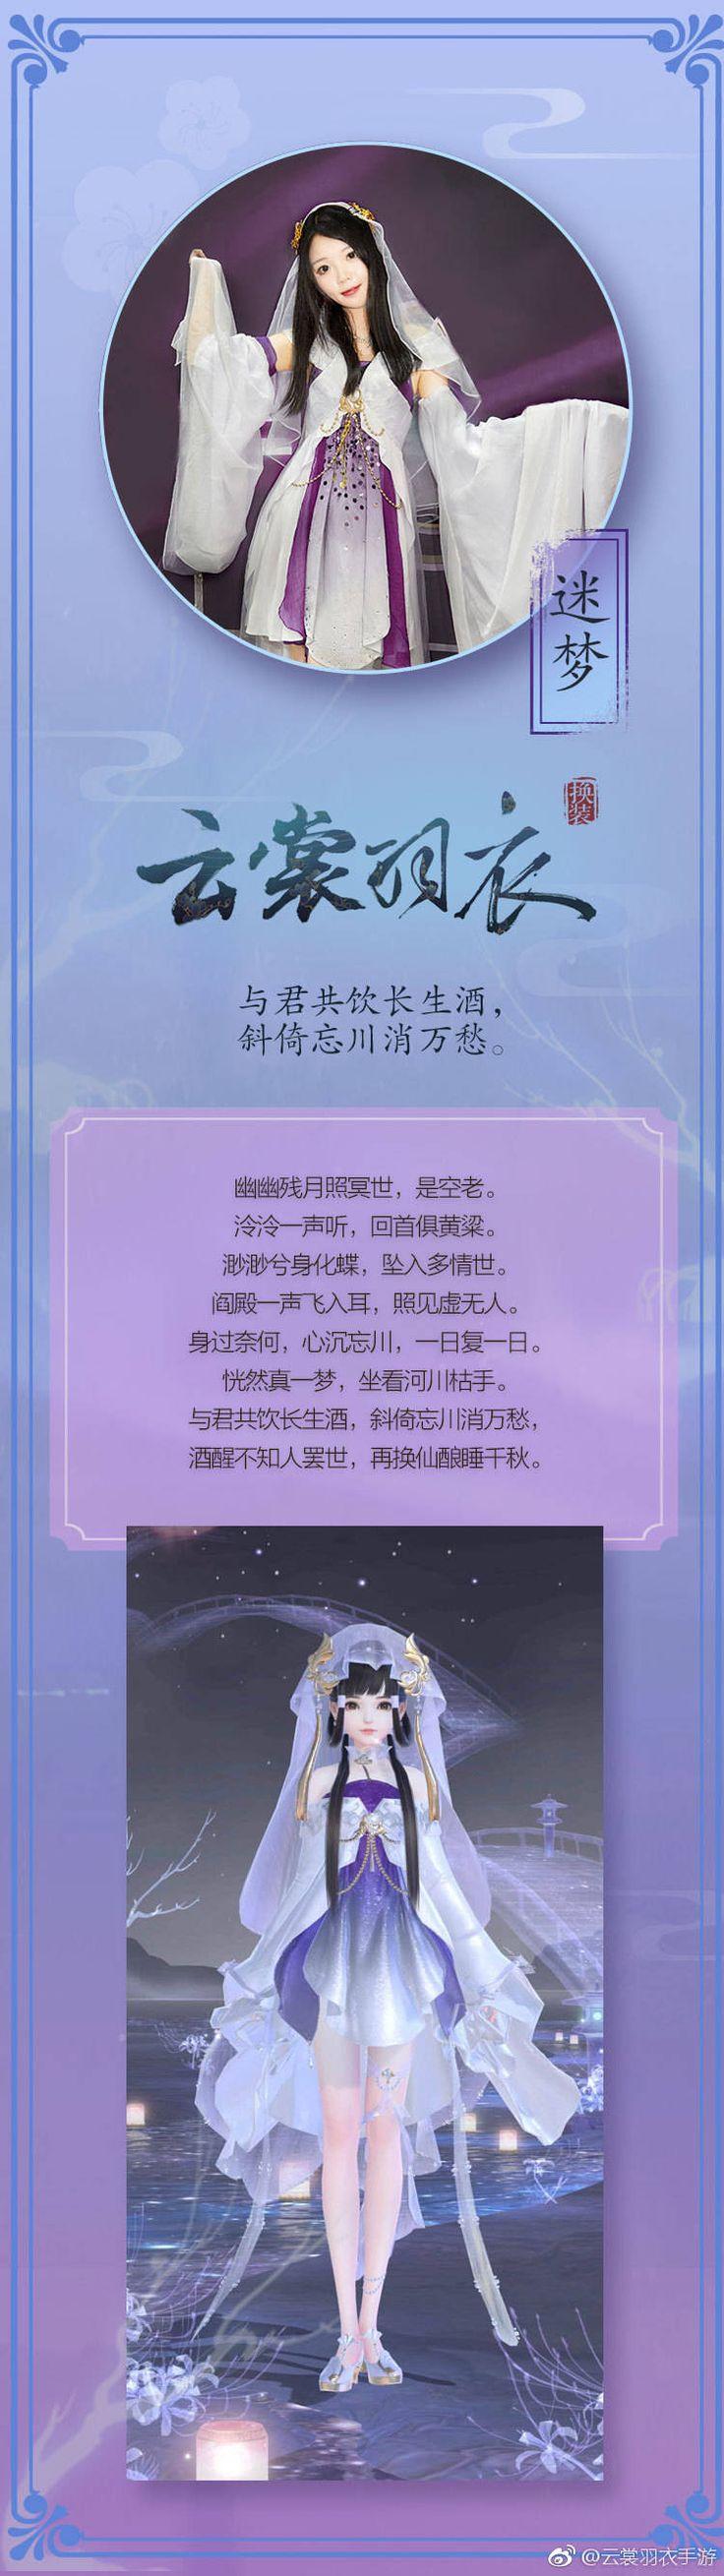 ꕥ 云裳羽衣 - Countdown Opening CN Ver. (27/06/2018) ในปี 2020